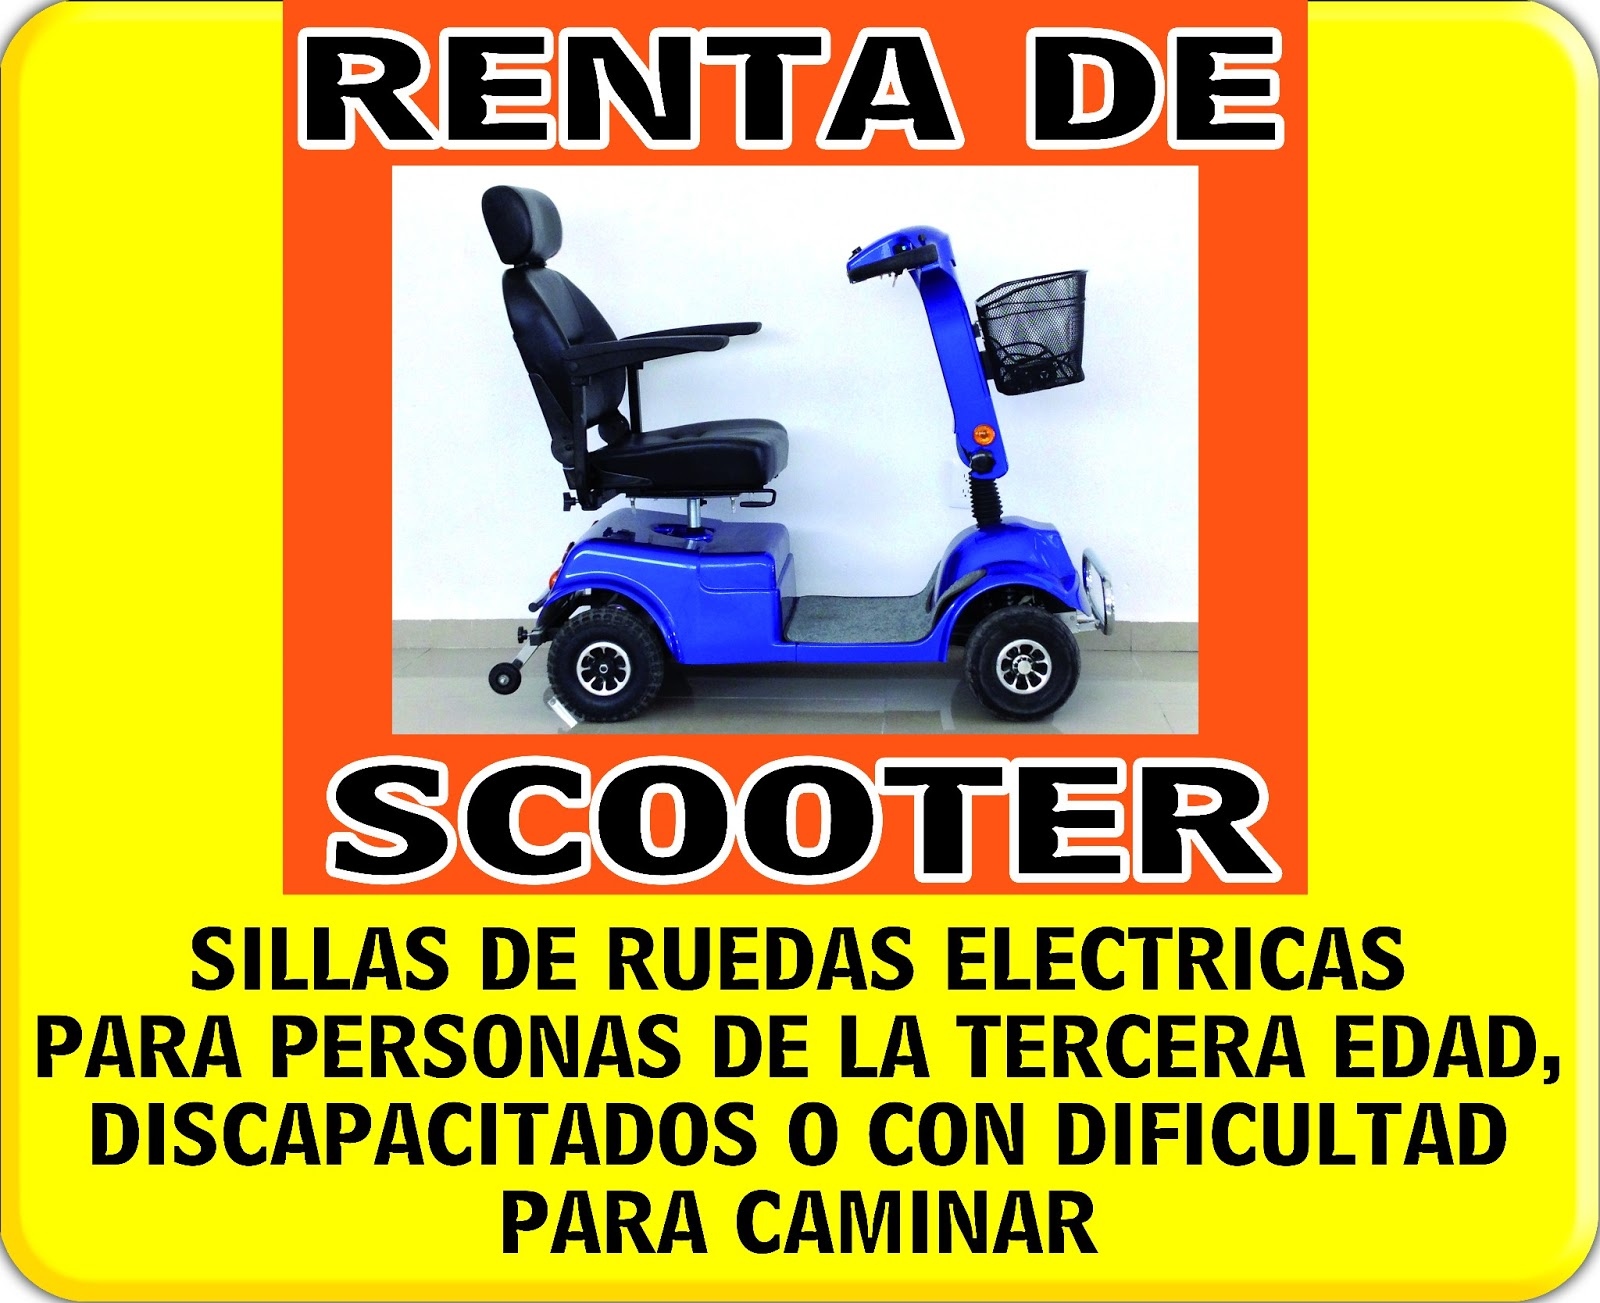 Sillas de ruedas electricas scooters cancun - Ruedas para muebles ...